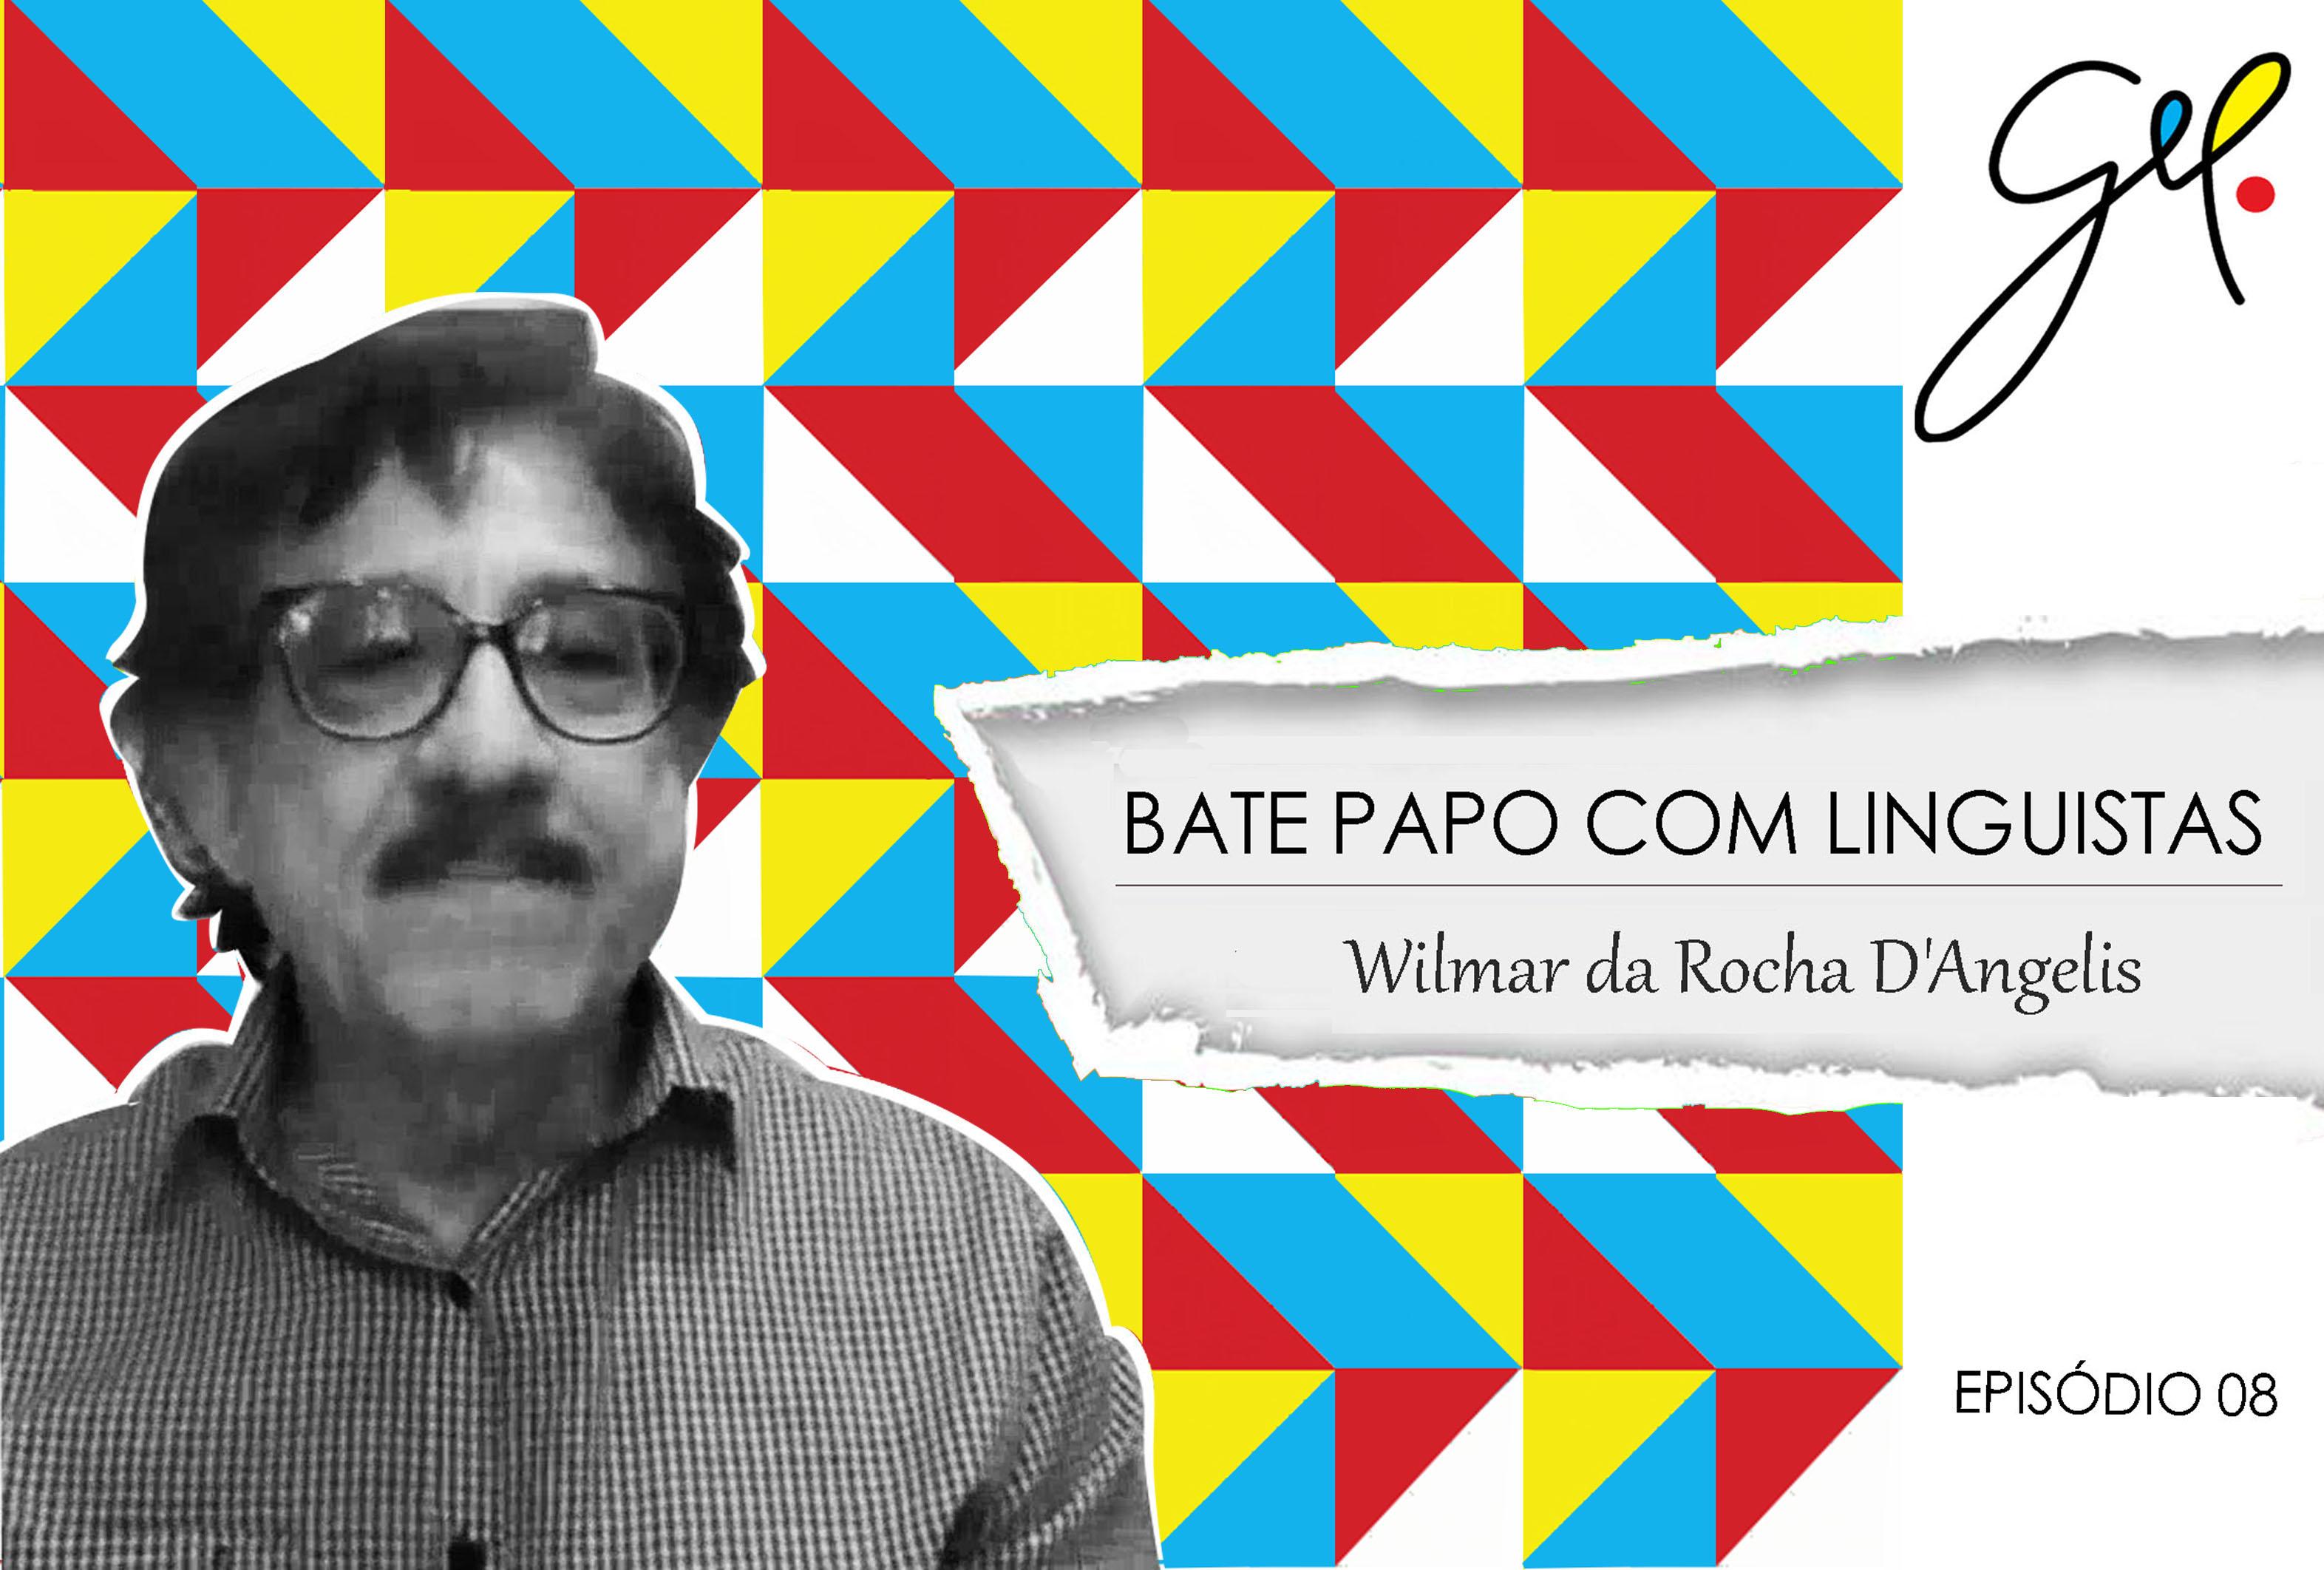 EP08 | Conversa com Wilmar da Rocha D'Angelis